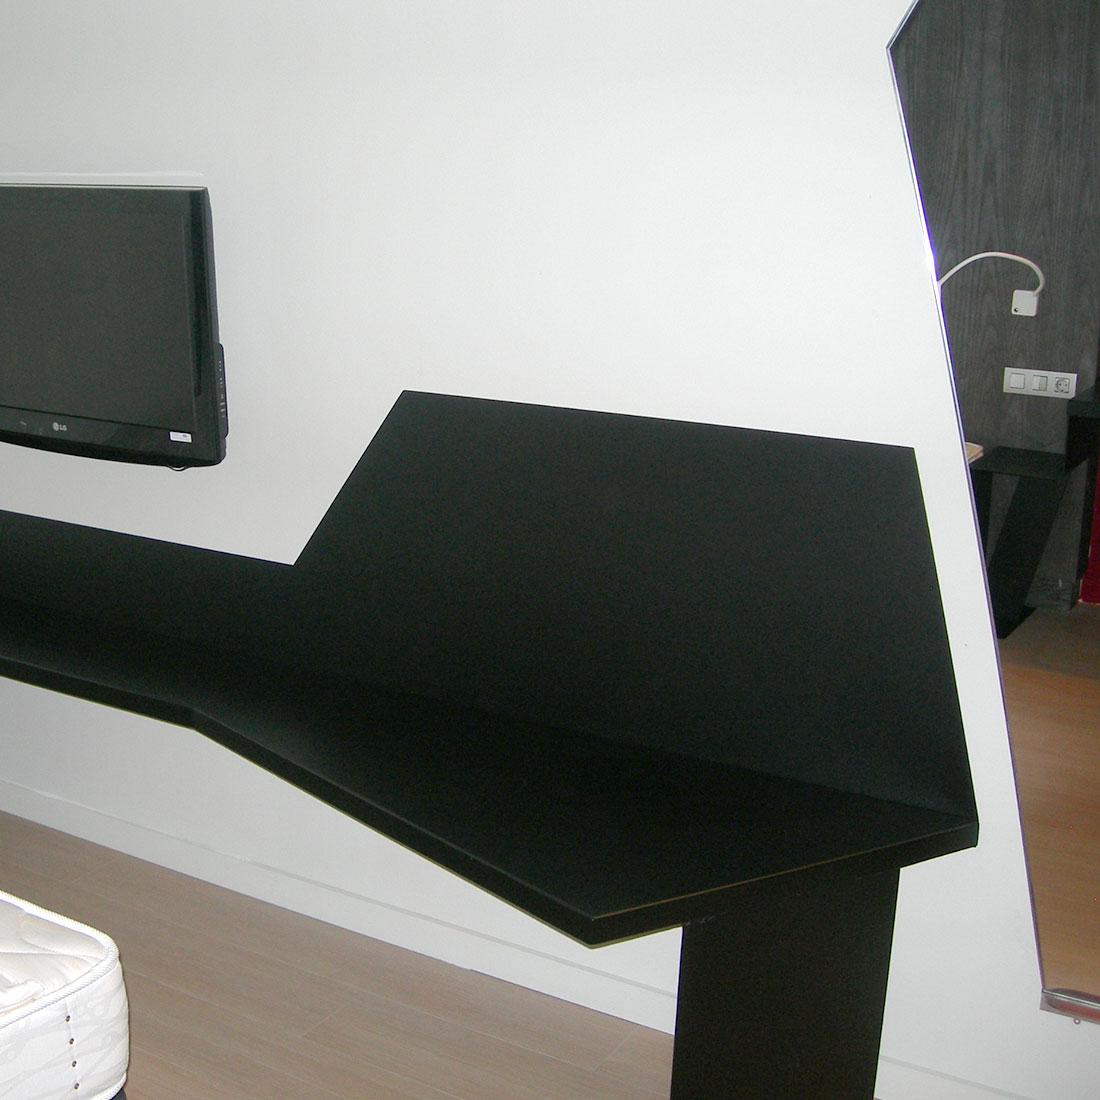 gadget-fugrup-hotel-rosello-decoracion-mesa-habitacion_01